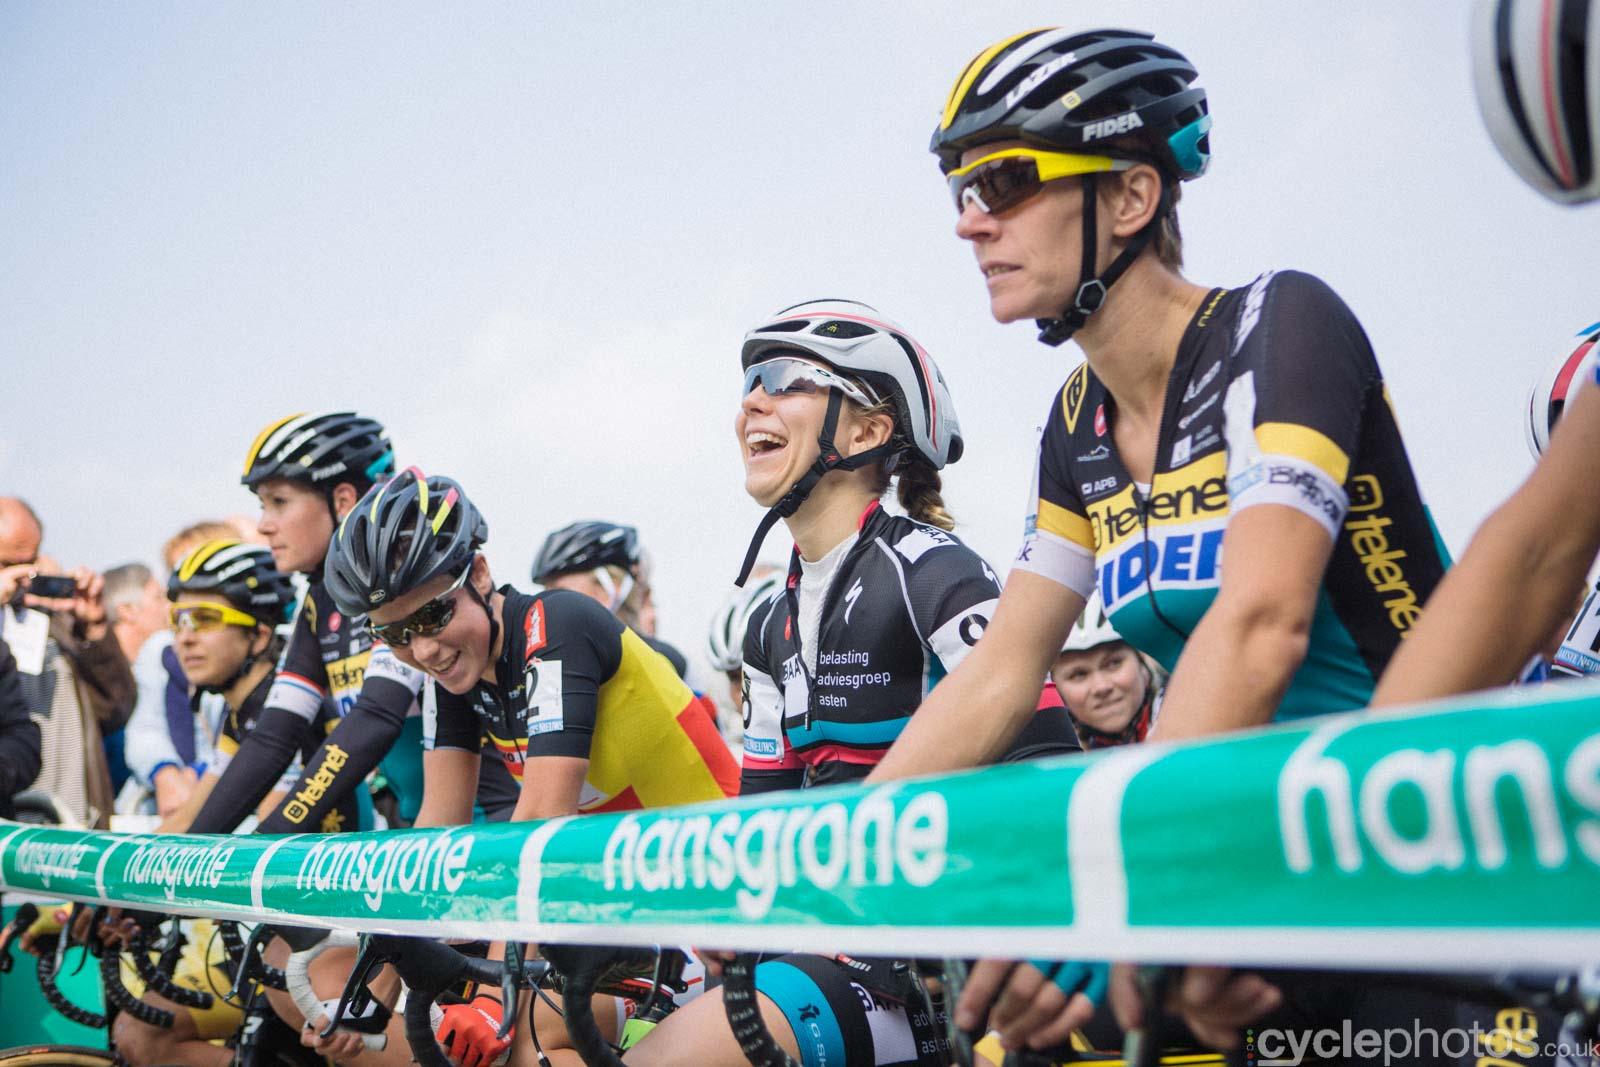 Sanne van Paassen laughs before the start of the women's Superprestige race in Gieten, The Netherlands. All rights reserved. �Balint Hamvas / Cyclephotos